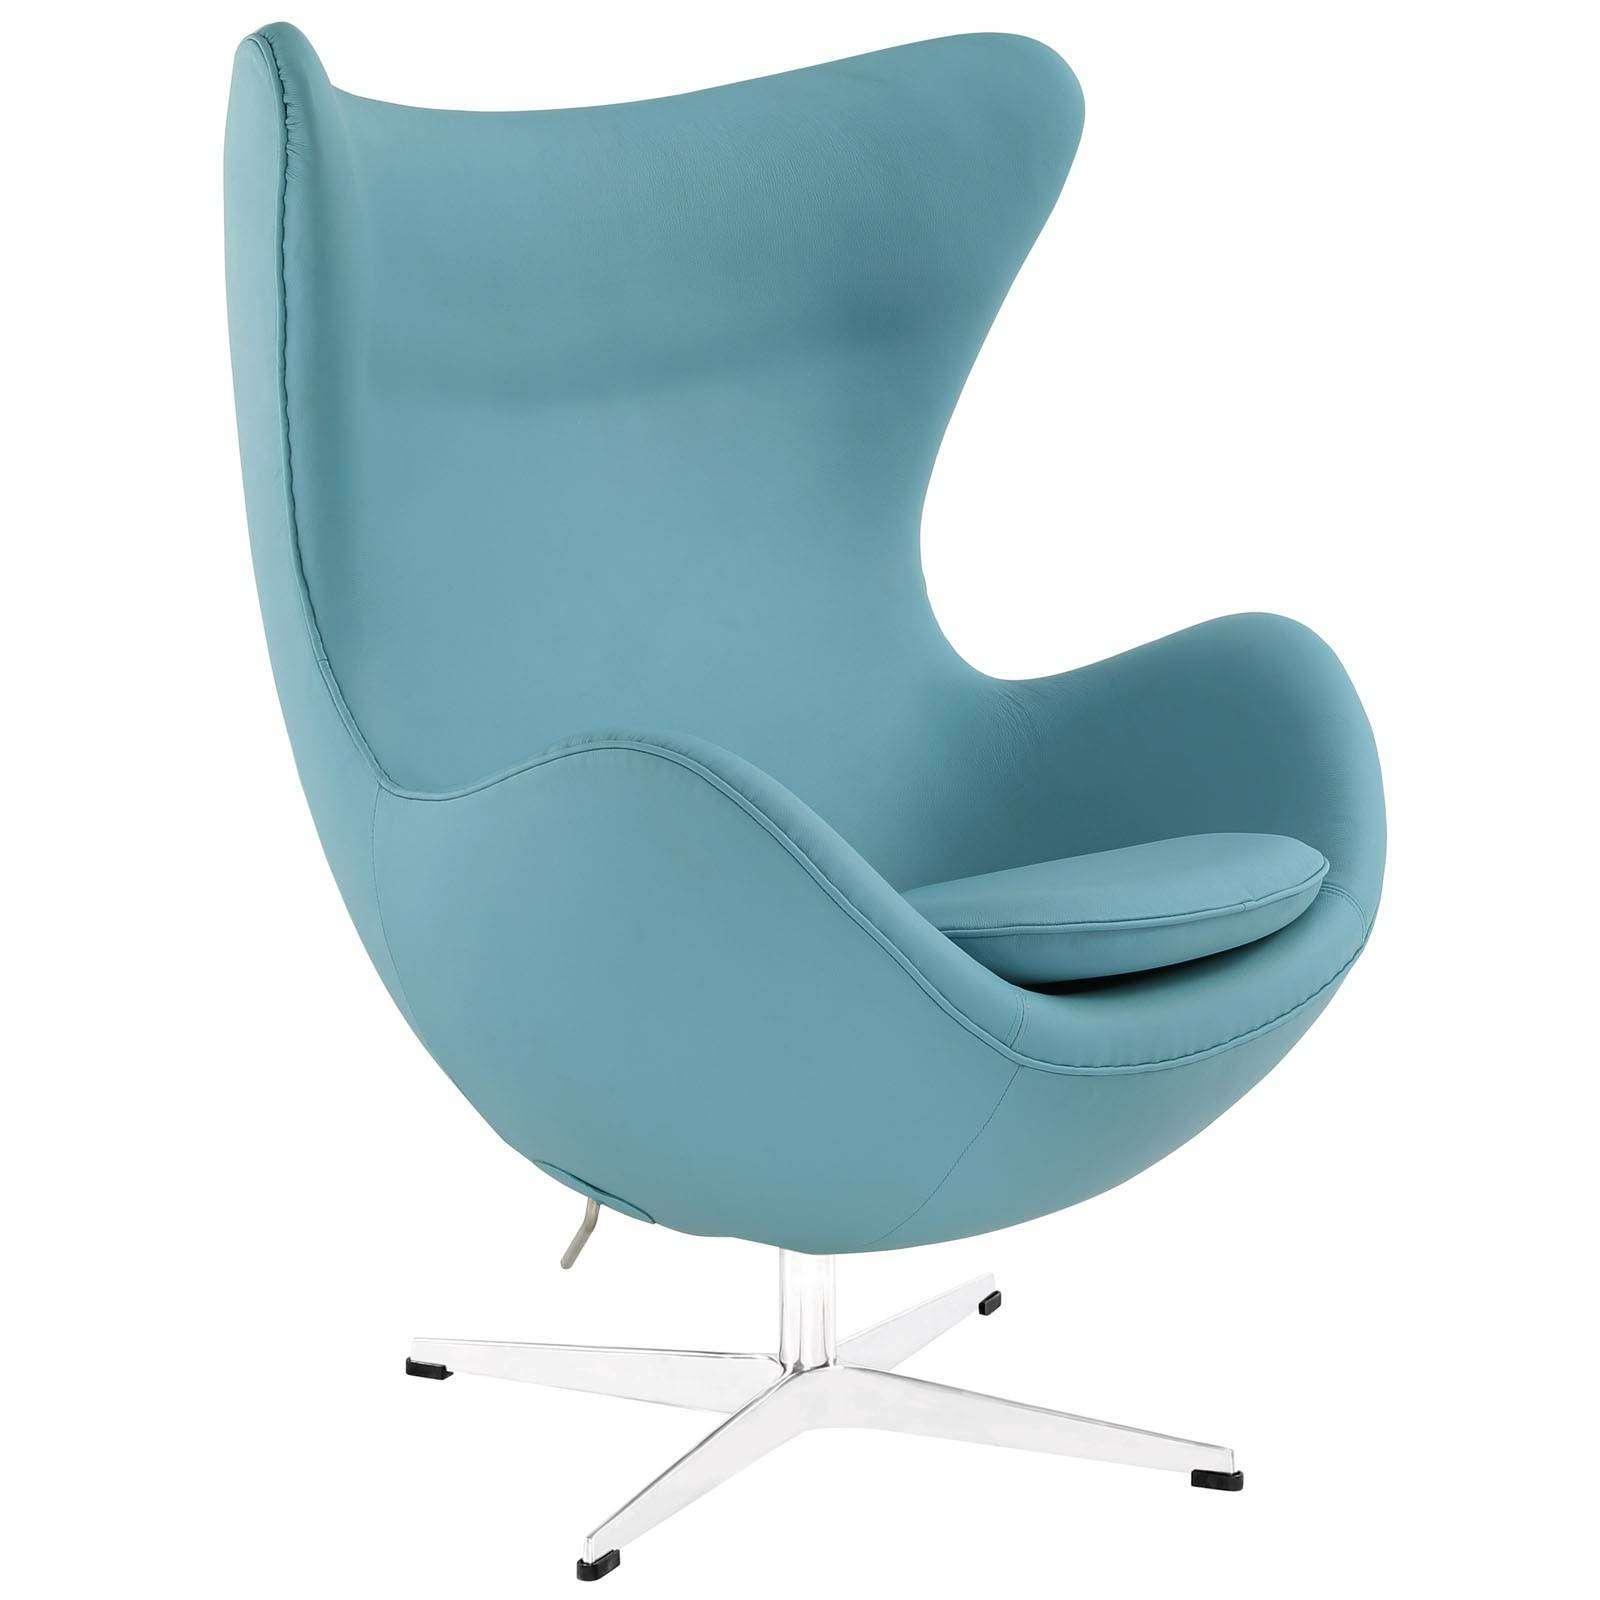 Foam baby chairs - Foam Baby Chairs 56